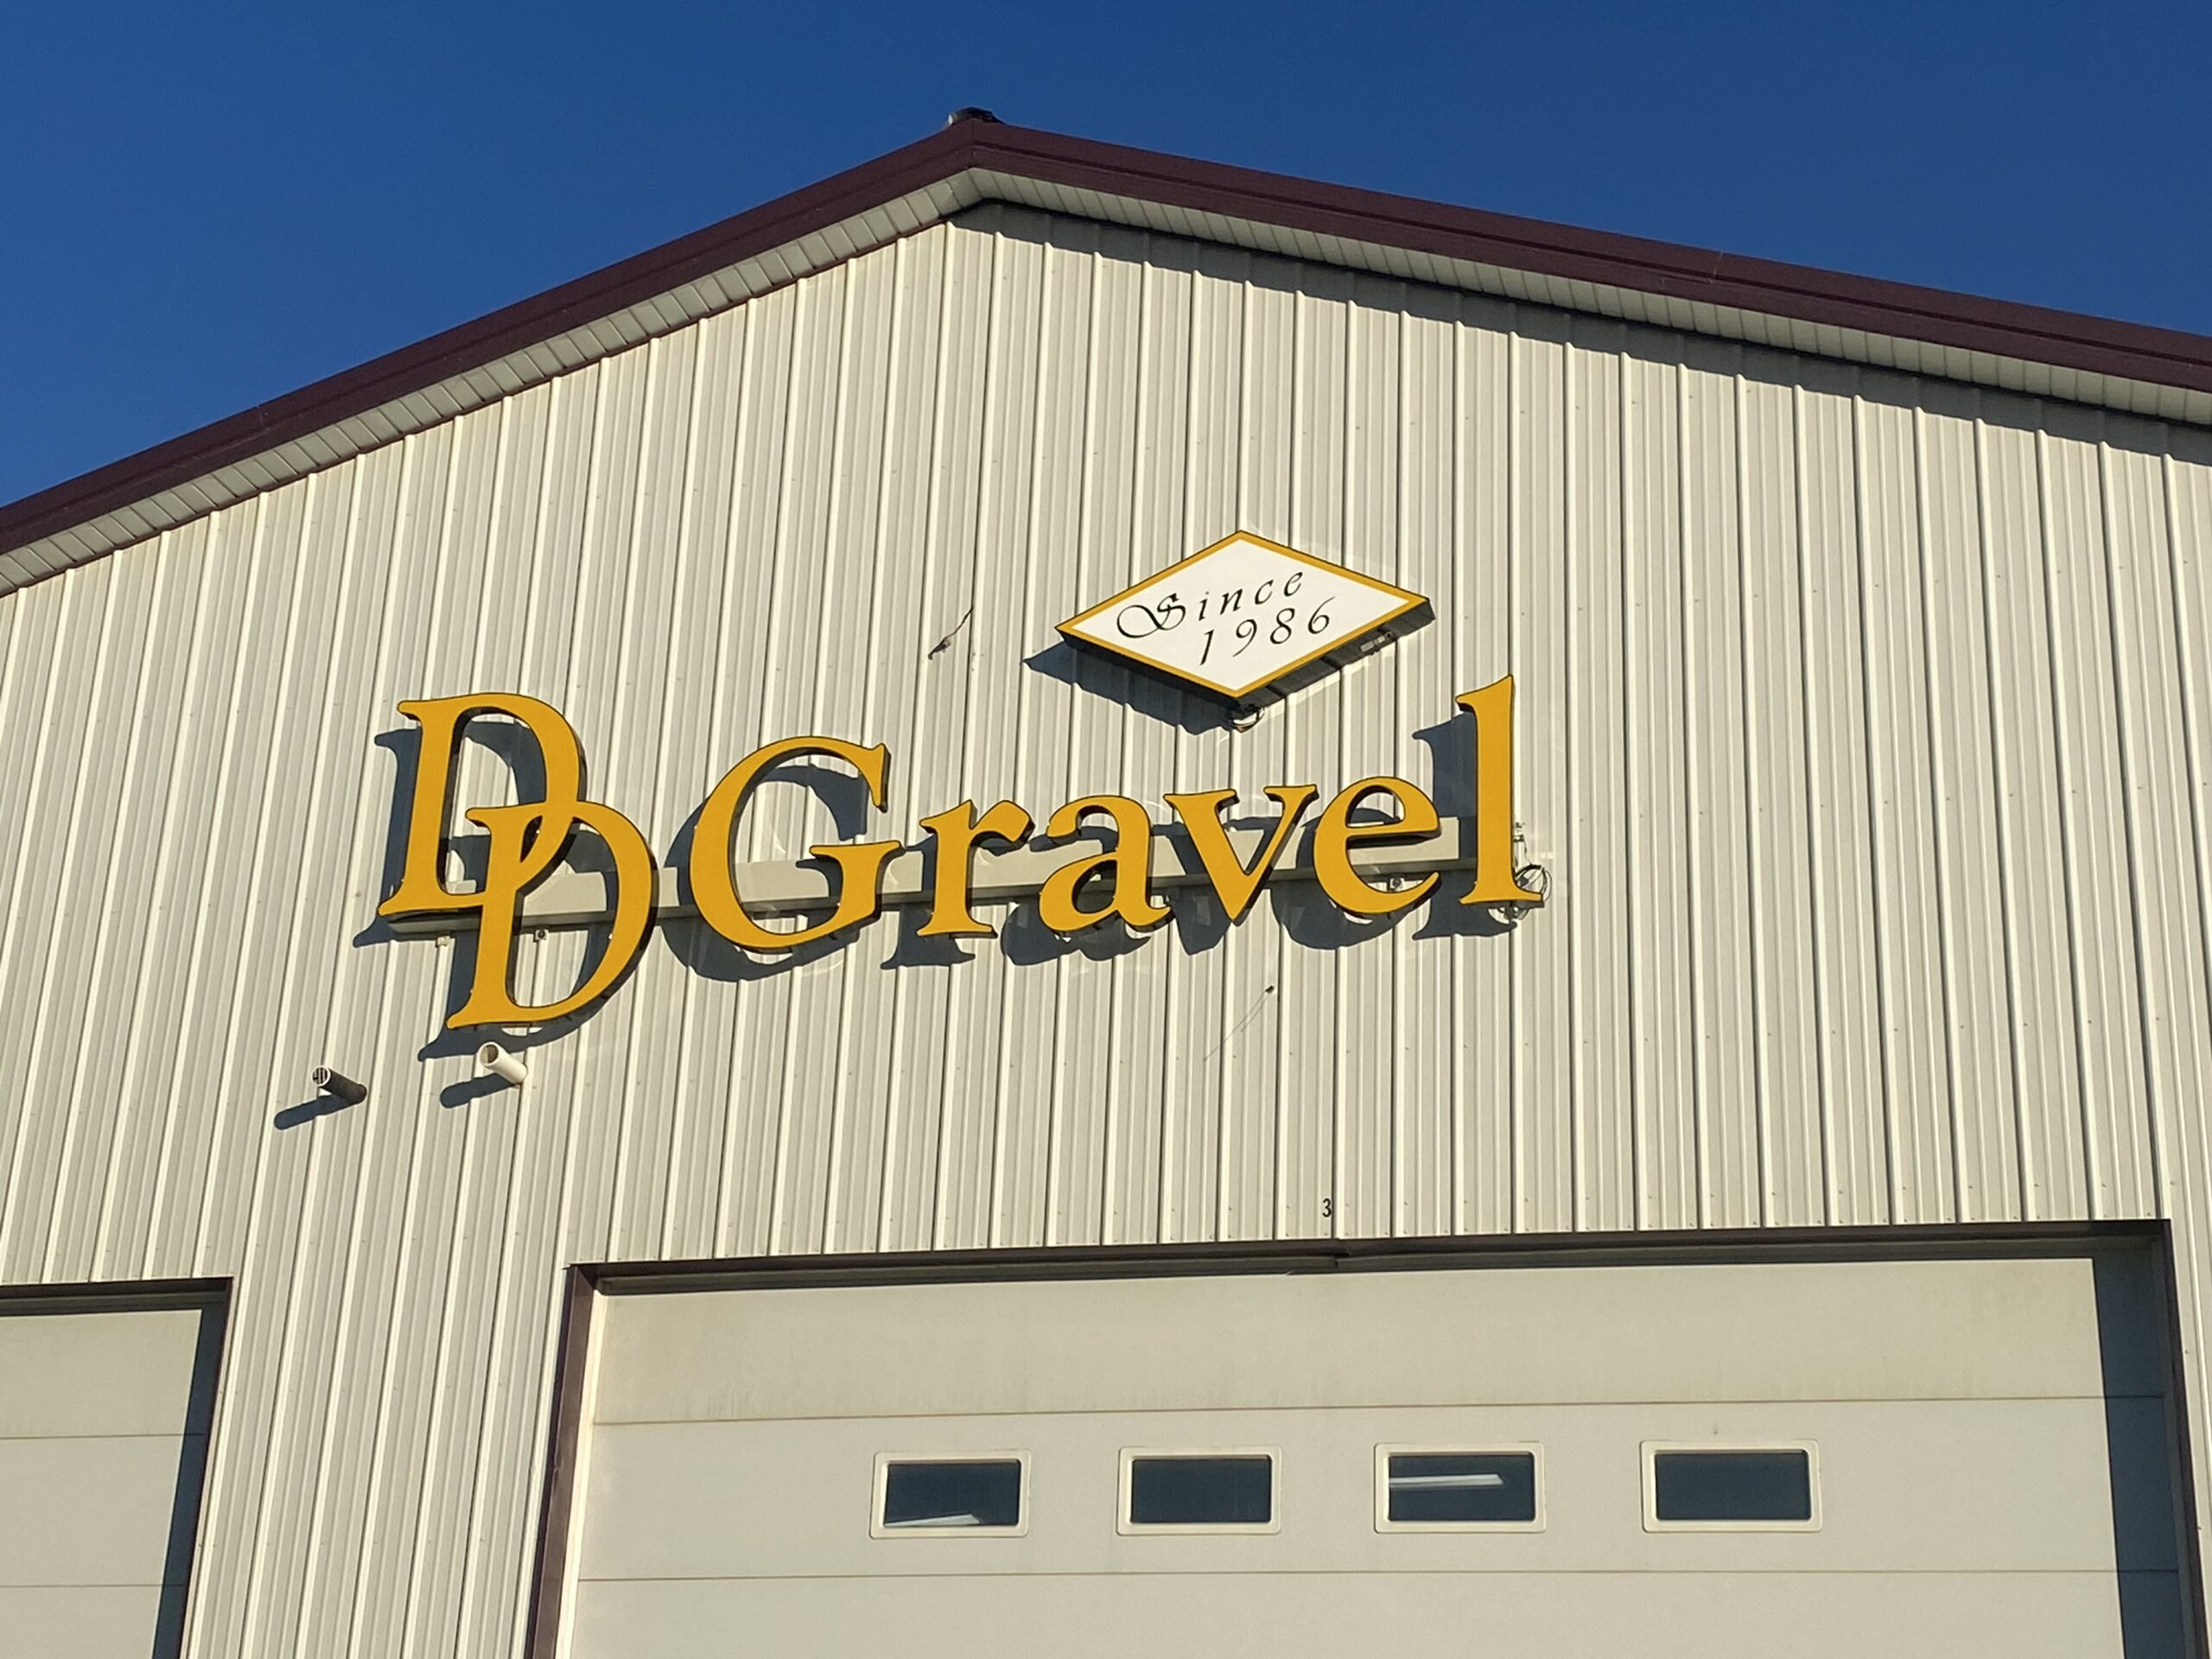 D&D Gravel